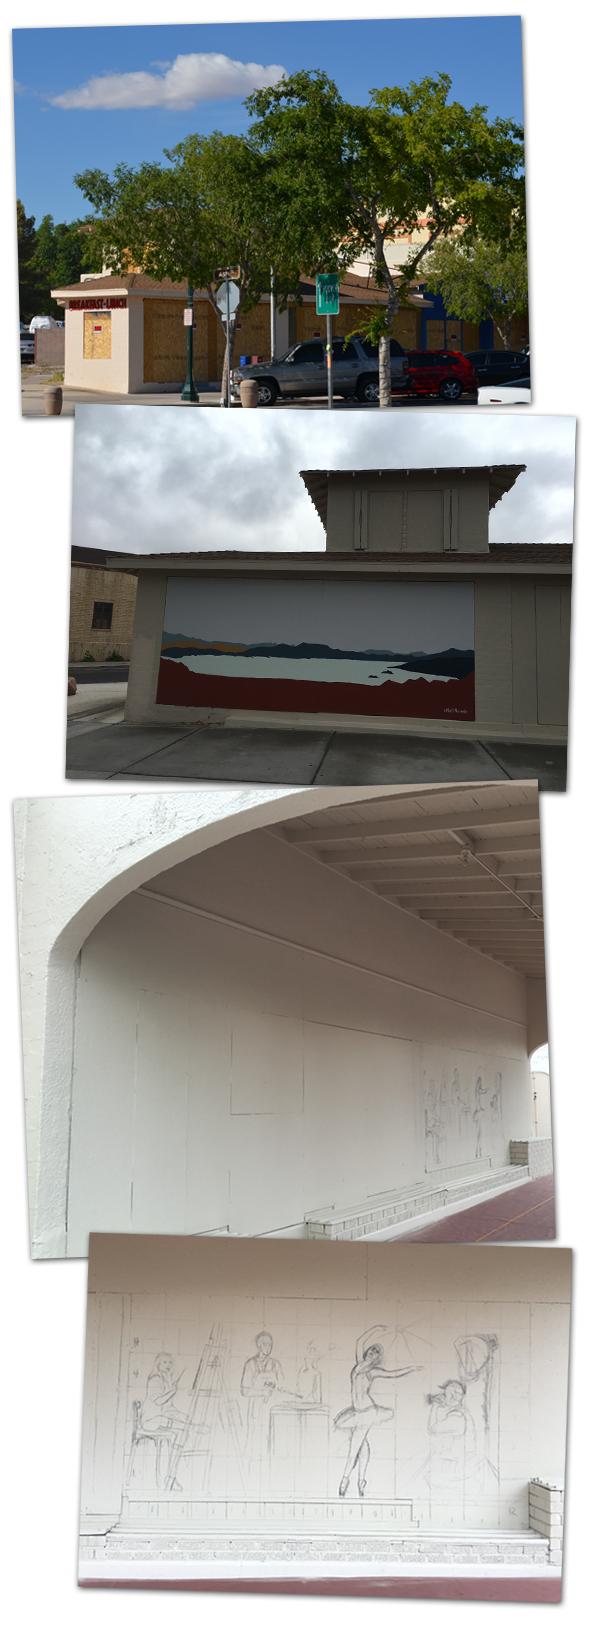 Browder Building Murals in Boulder City, Nevada